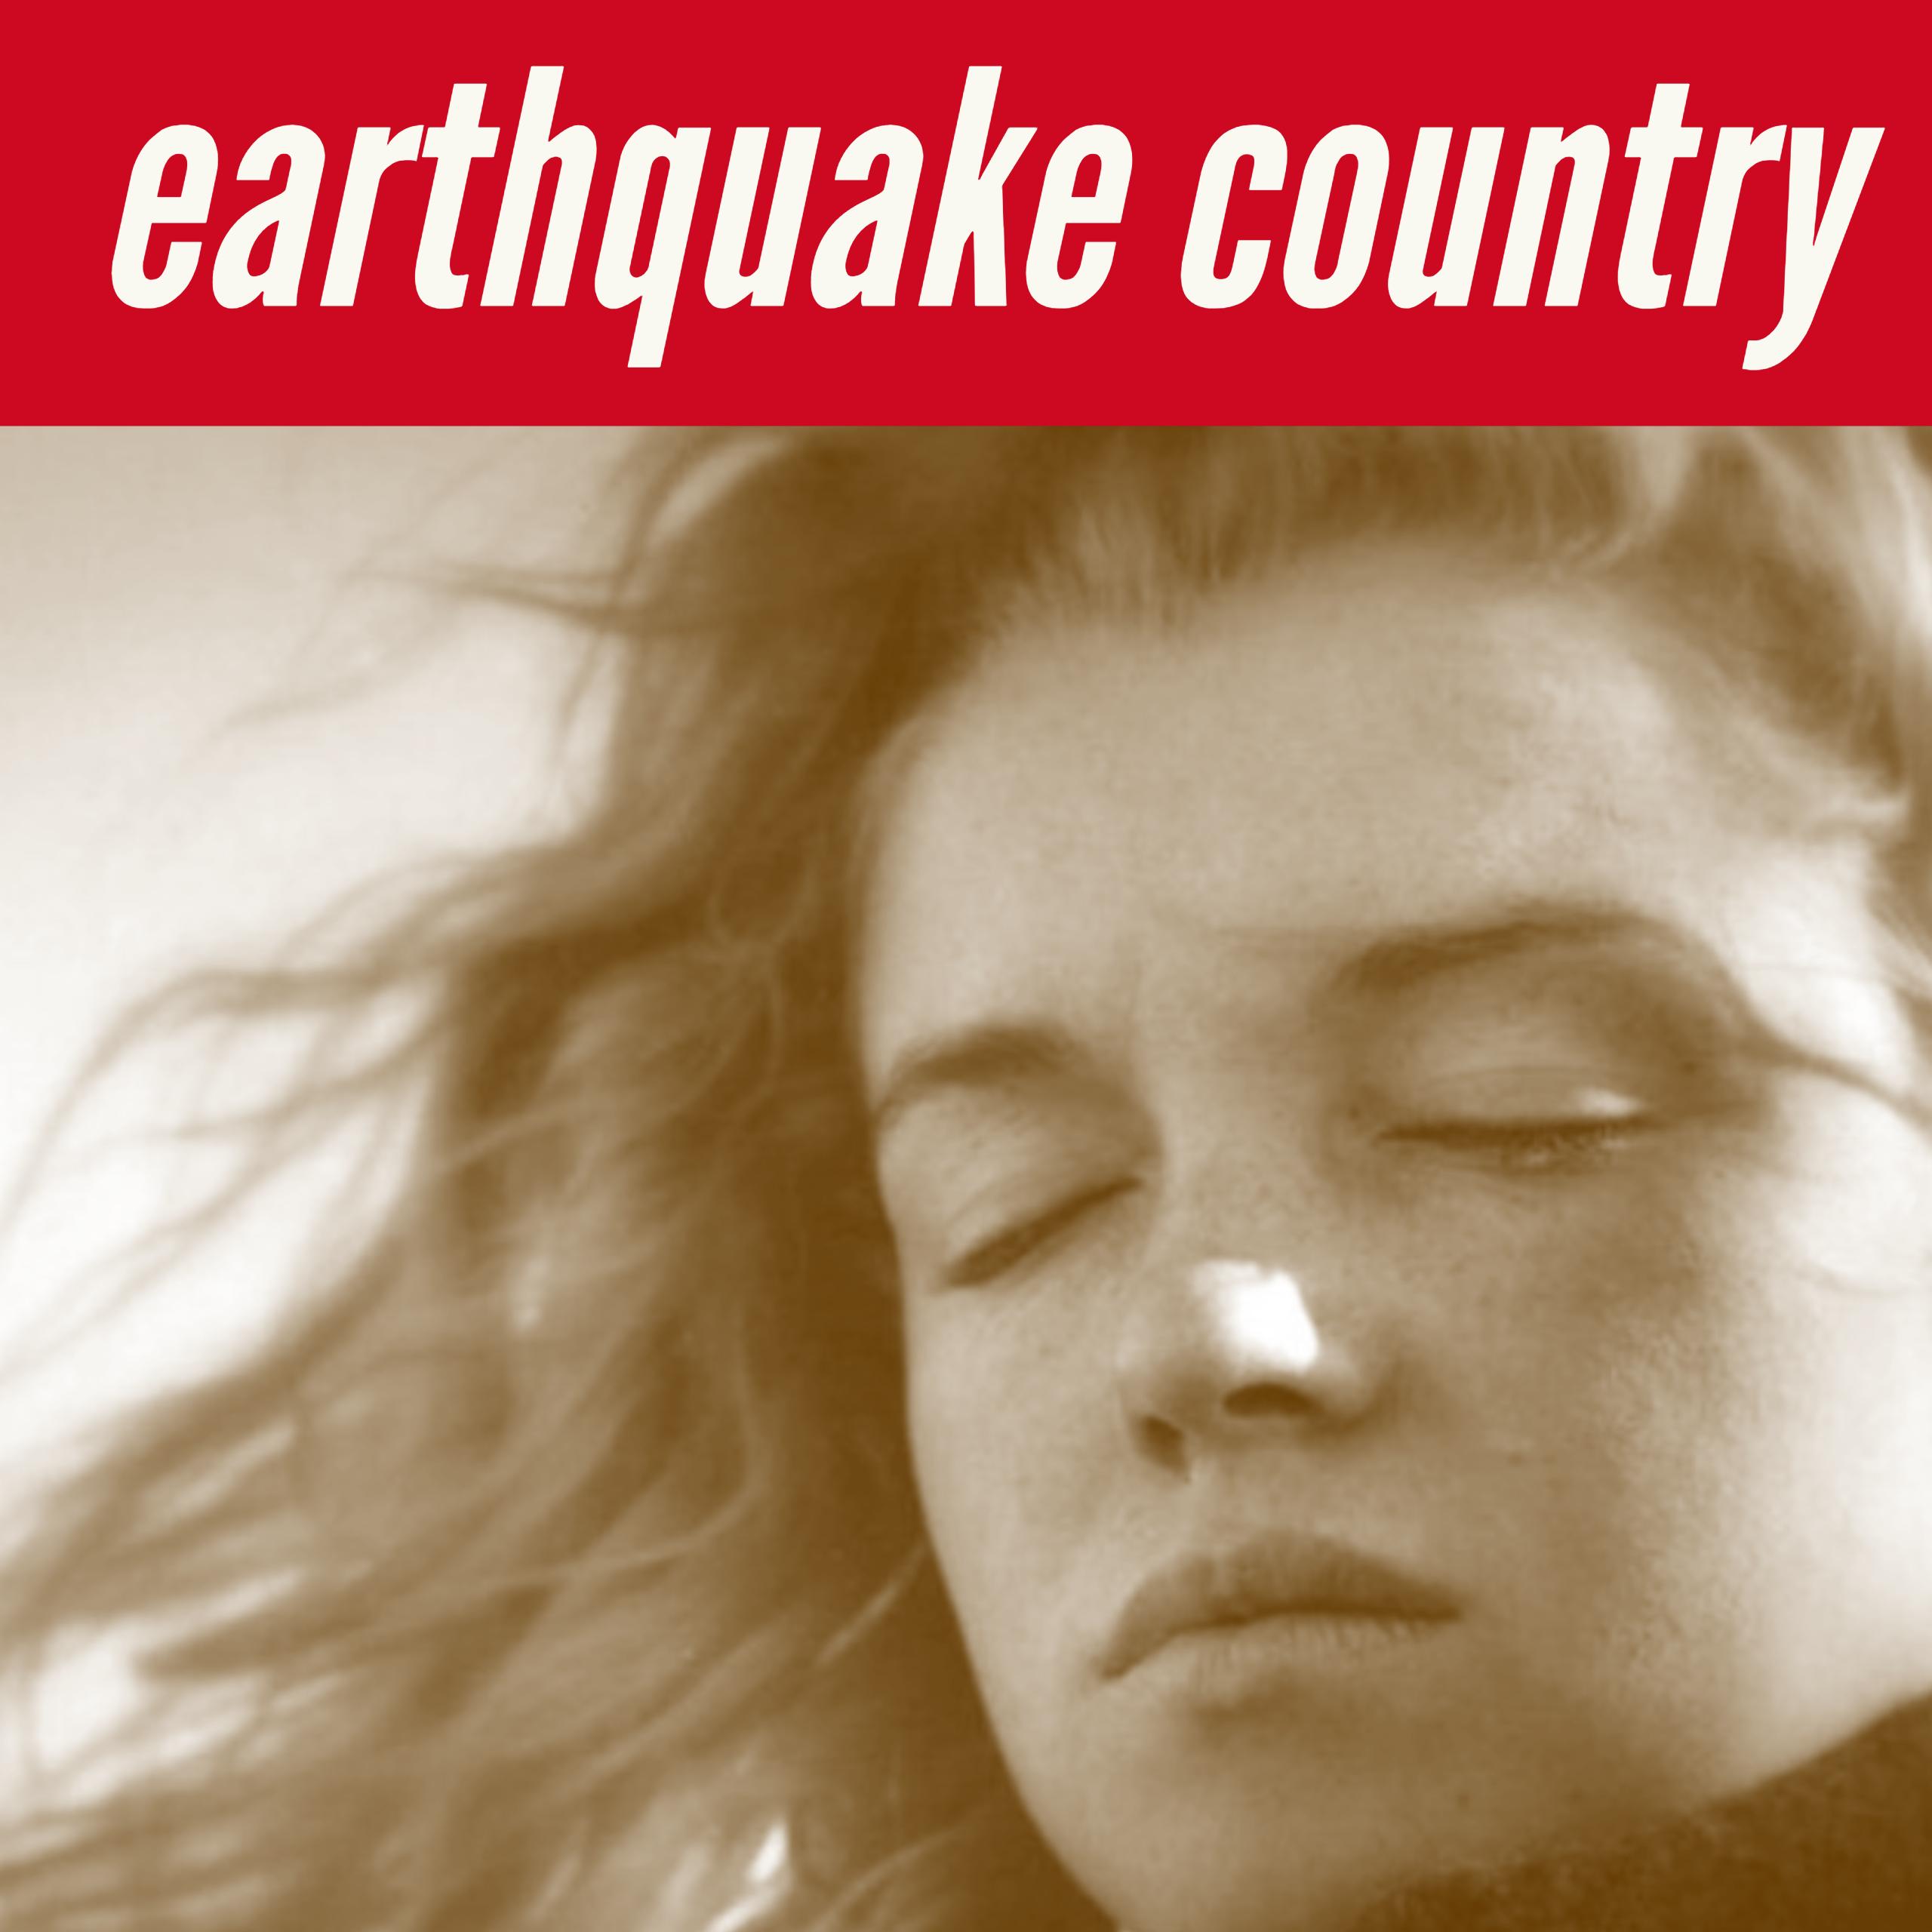 Earthquake_Country_cover.jpg